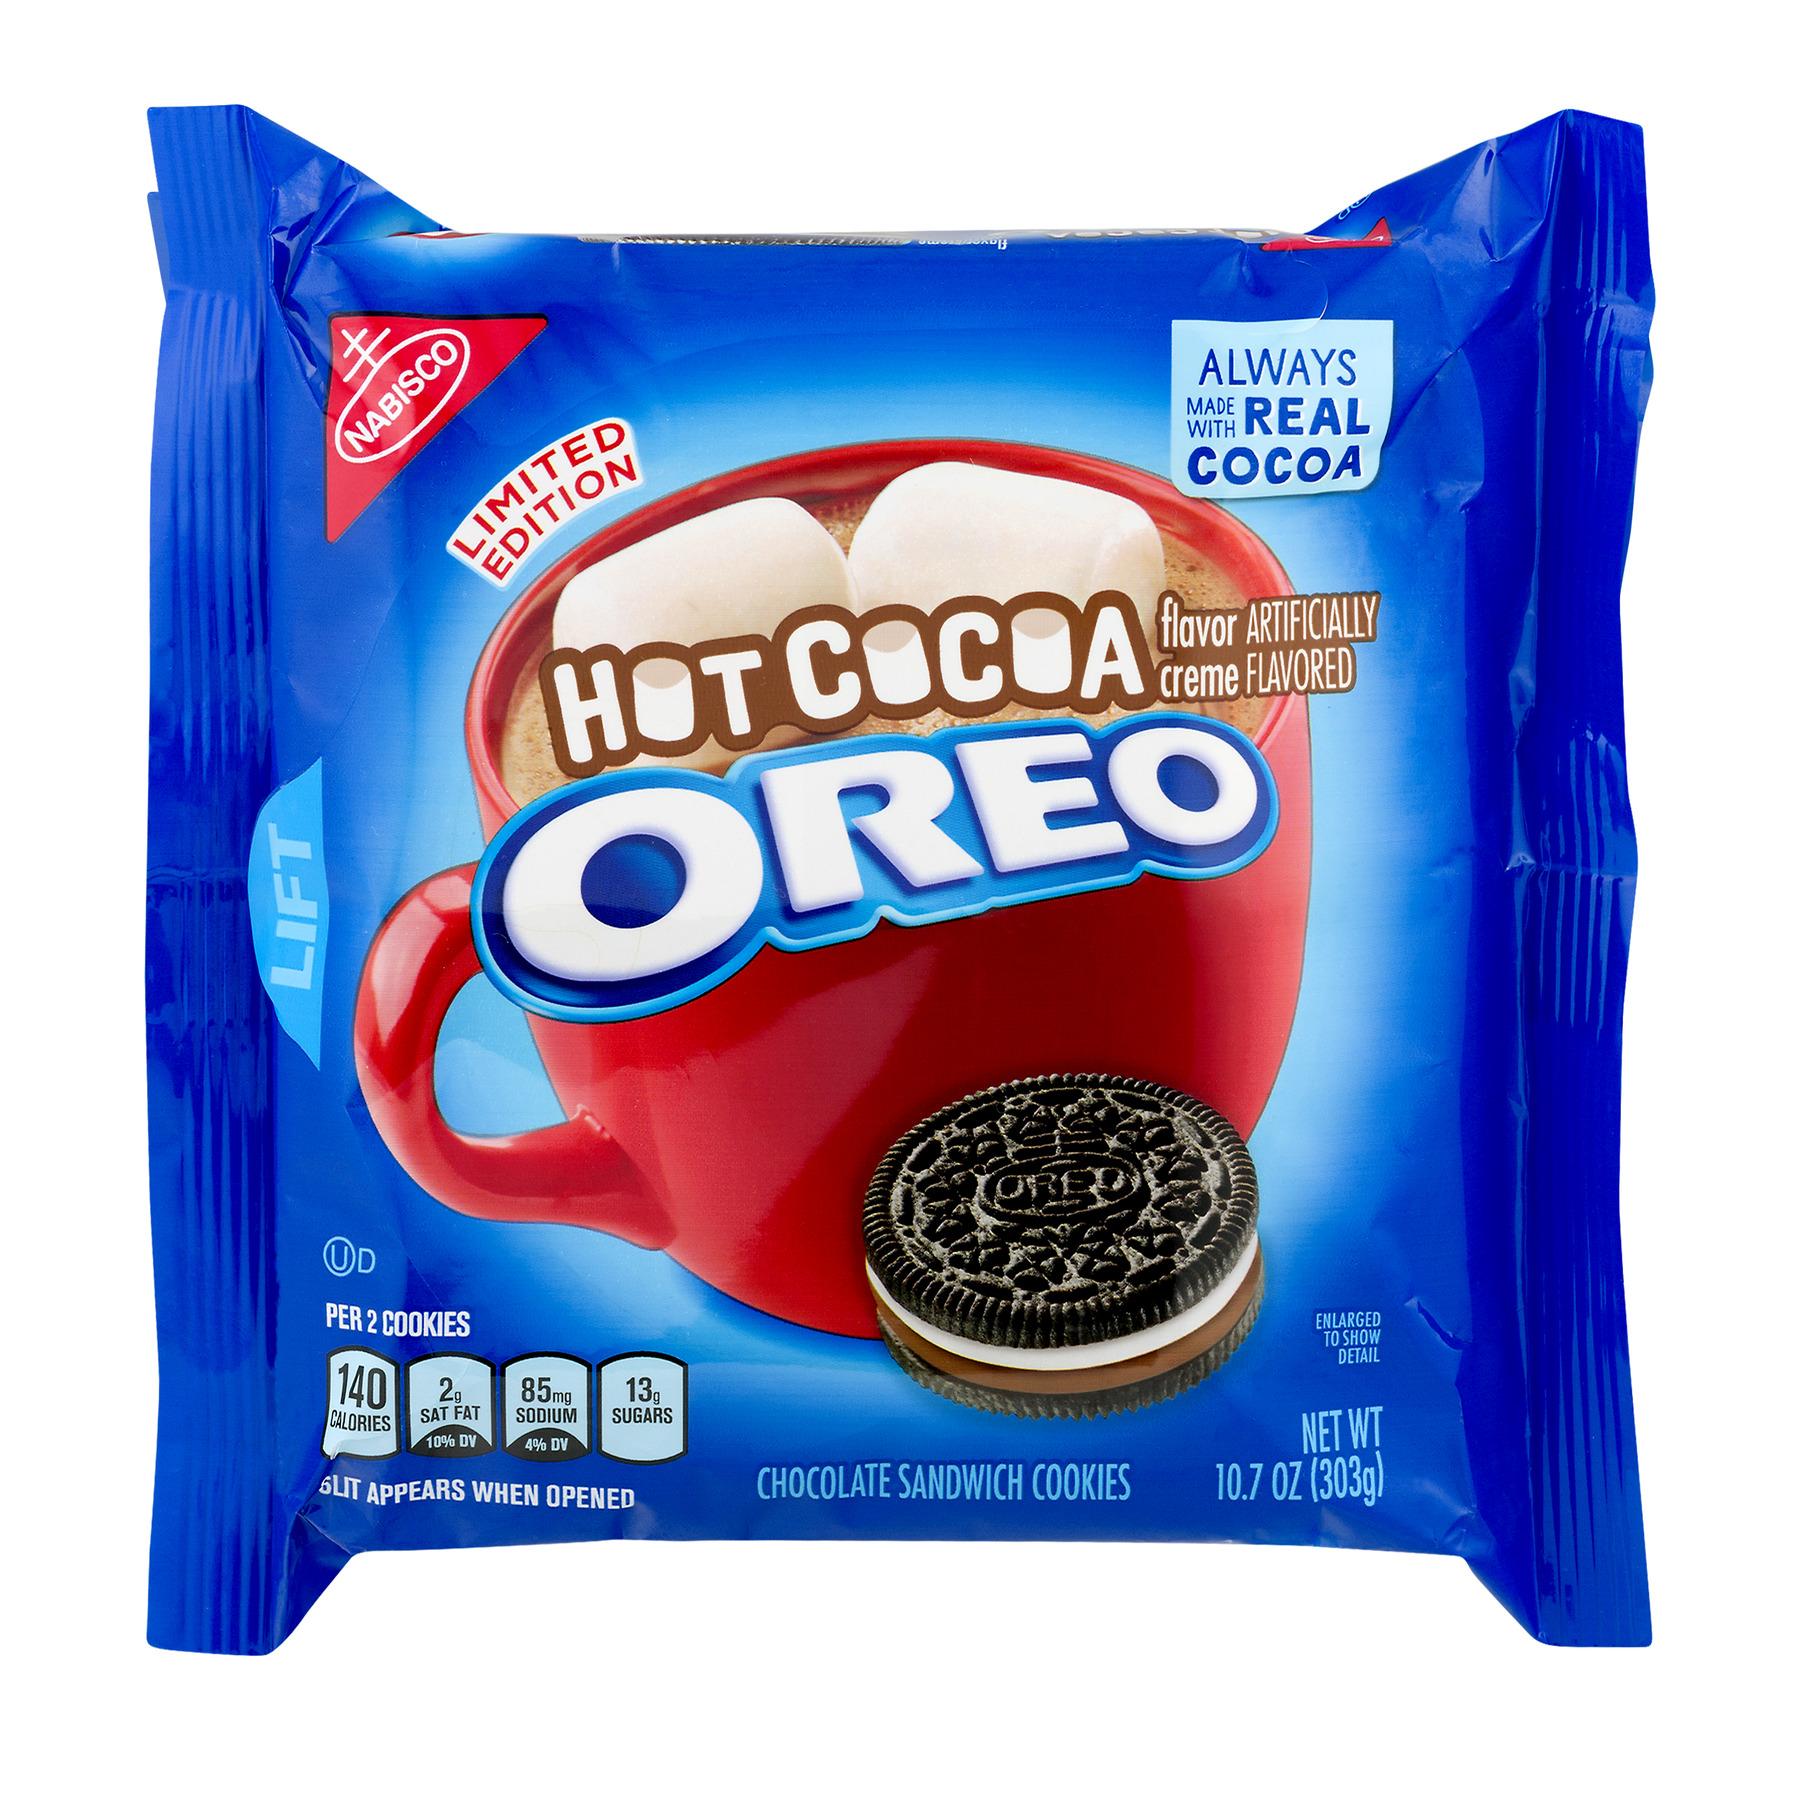 Oreo Hot Cocoa Chocolate Sandwich Cookies